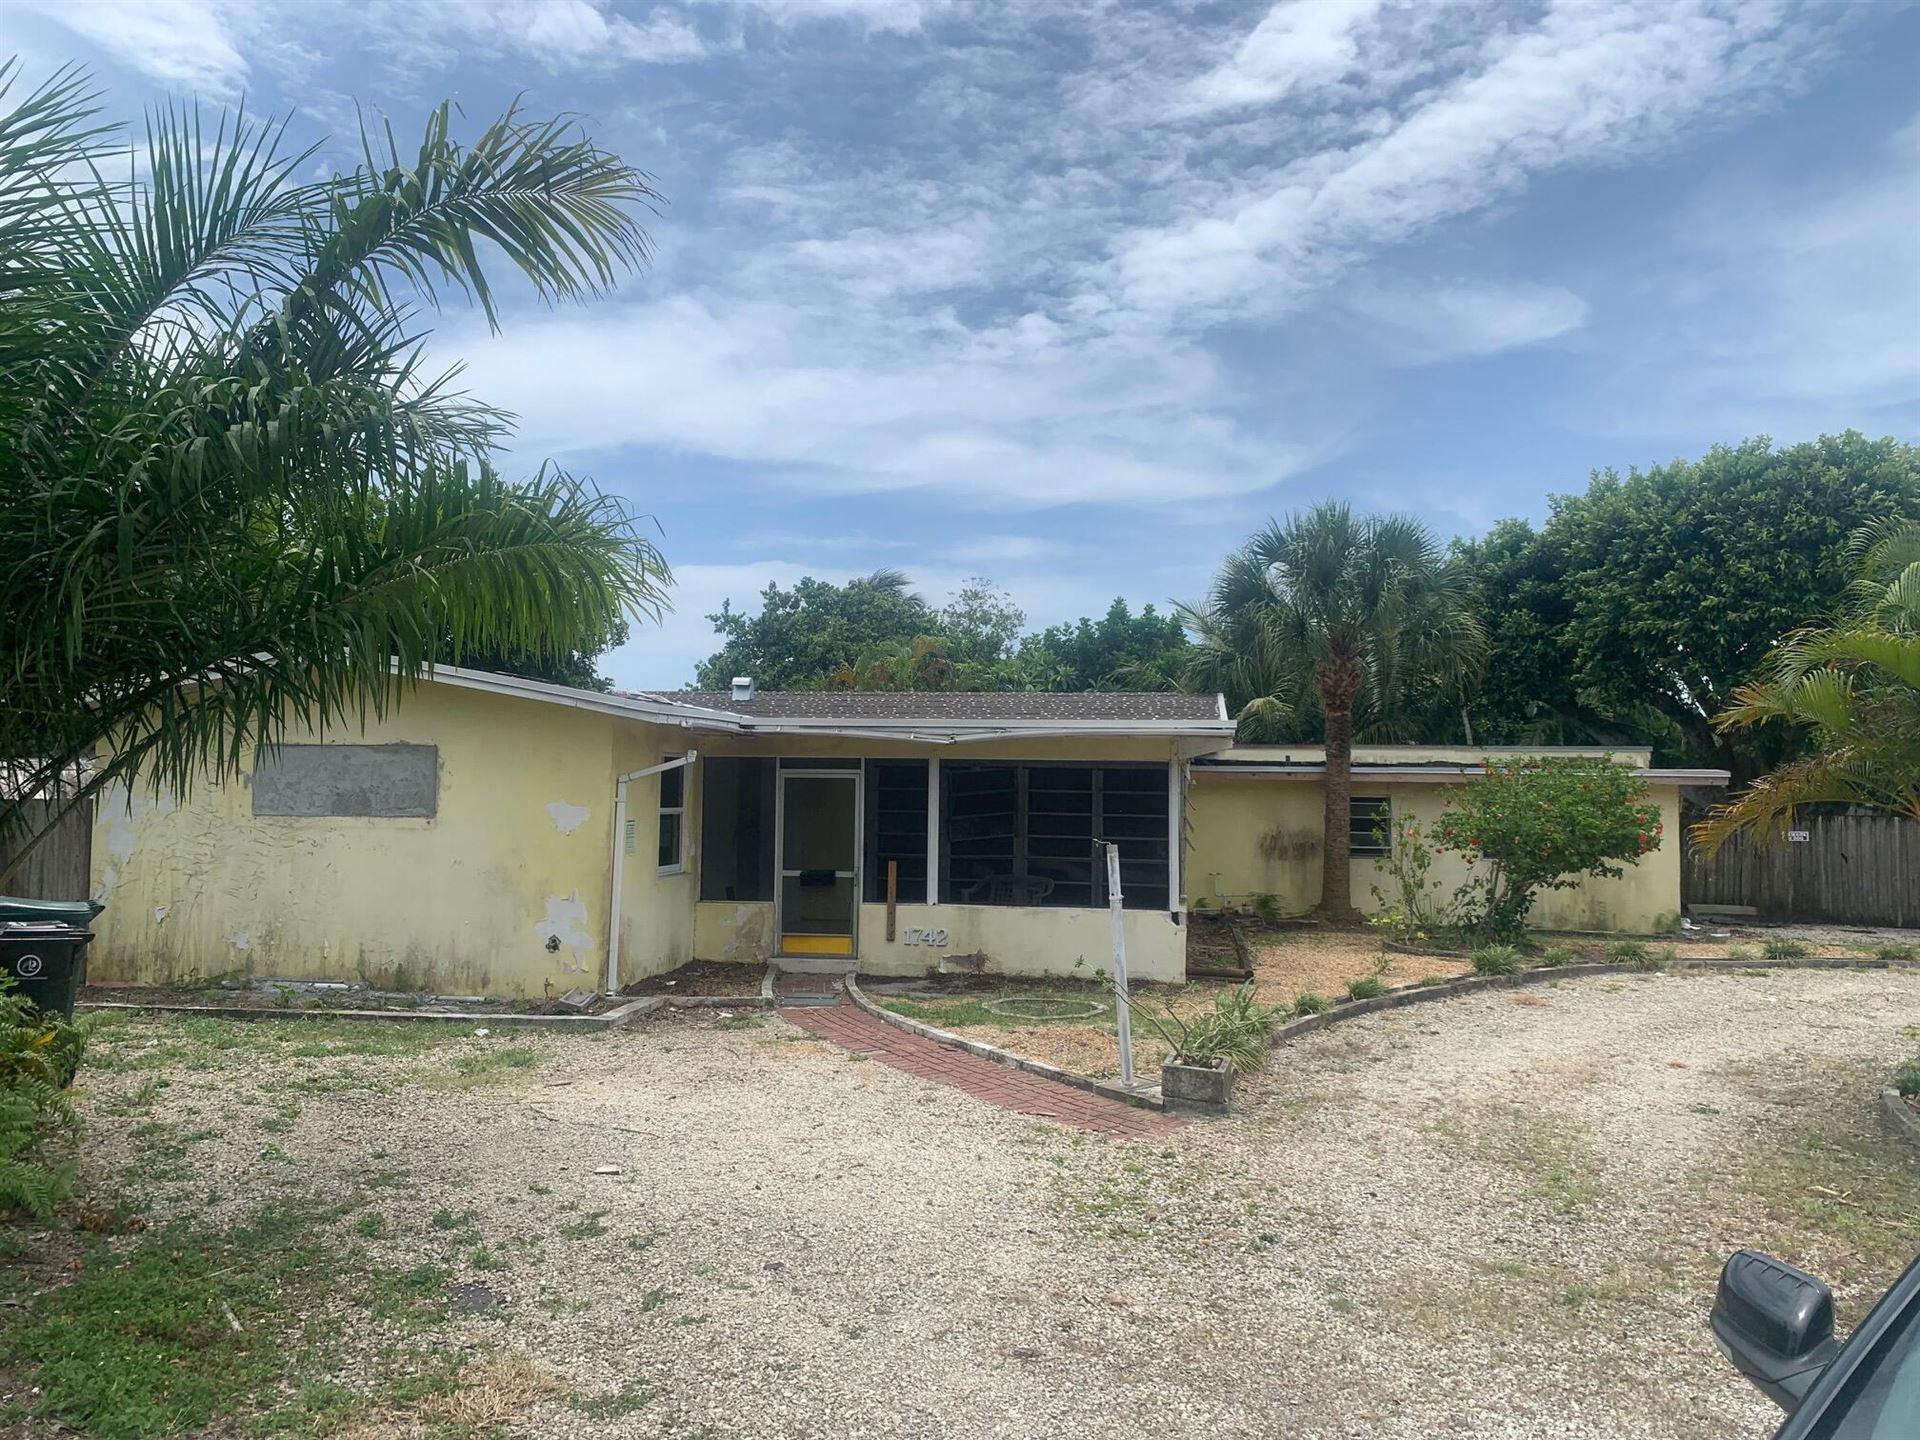 Photo of 1742 NE 7th Terrace, Fort Lauderdale, FL 33305 (MLS # RX-10742141)